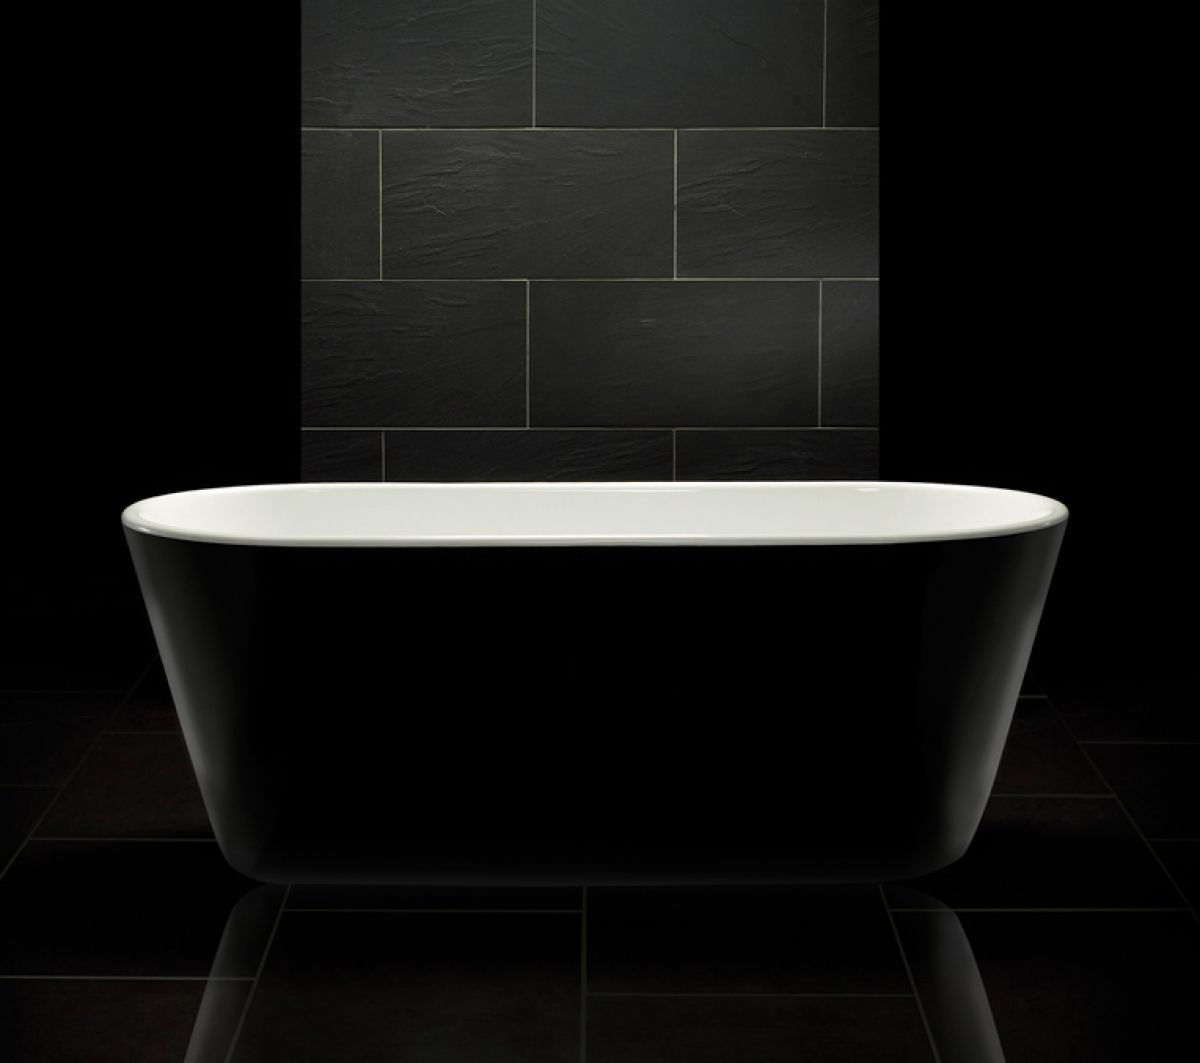 Royce Morgan Sapphire 1650mm Freestanding Bath Uk Bathrooms